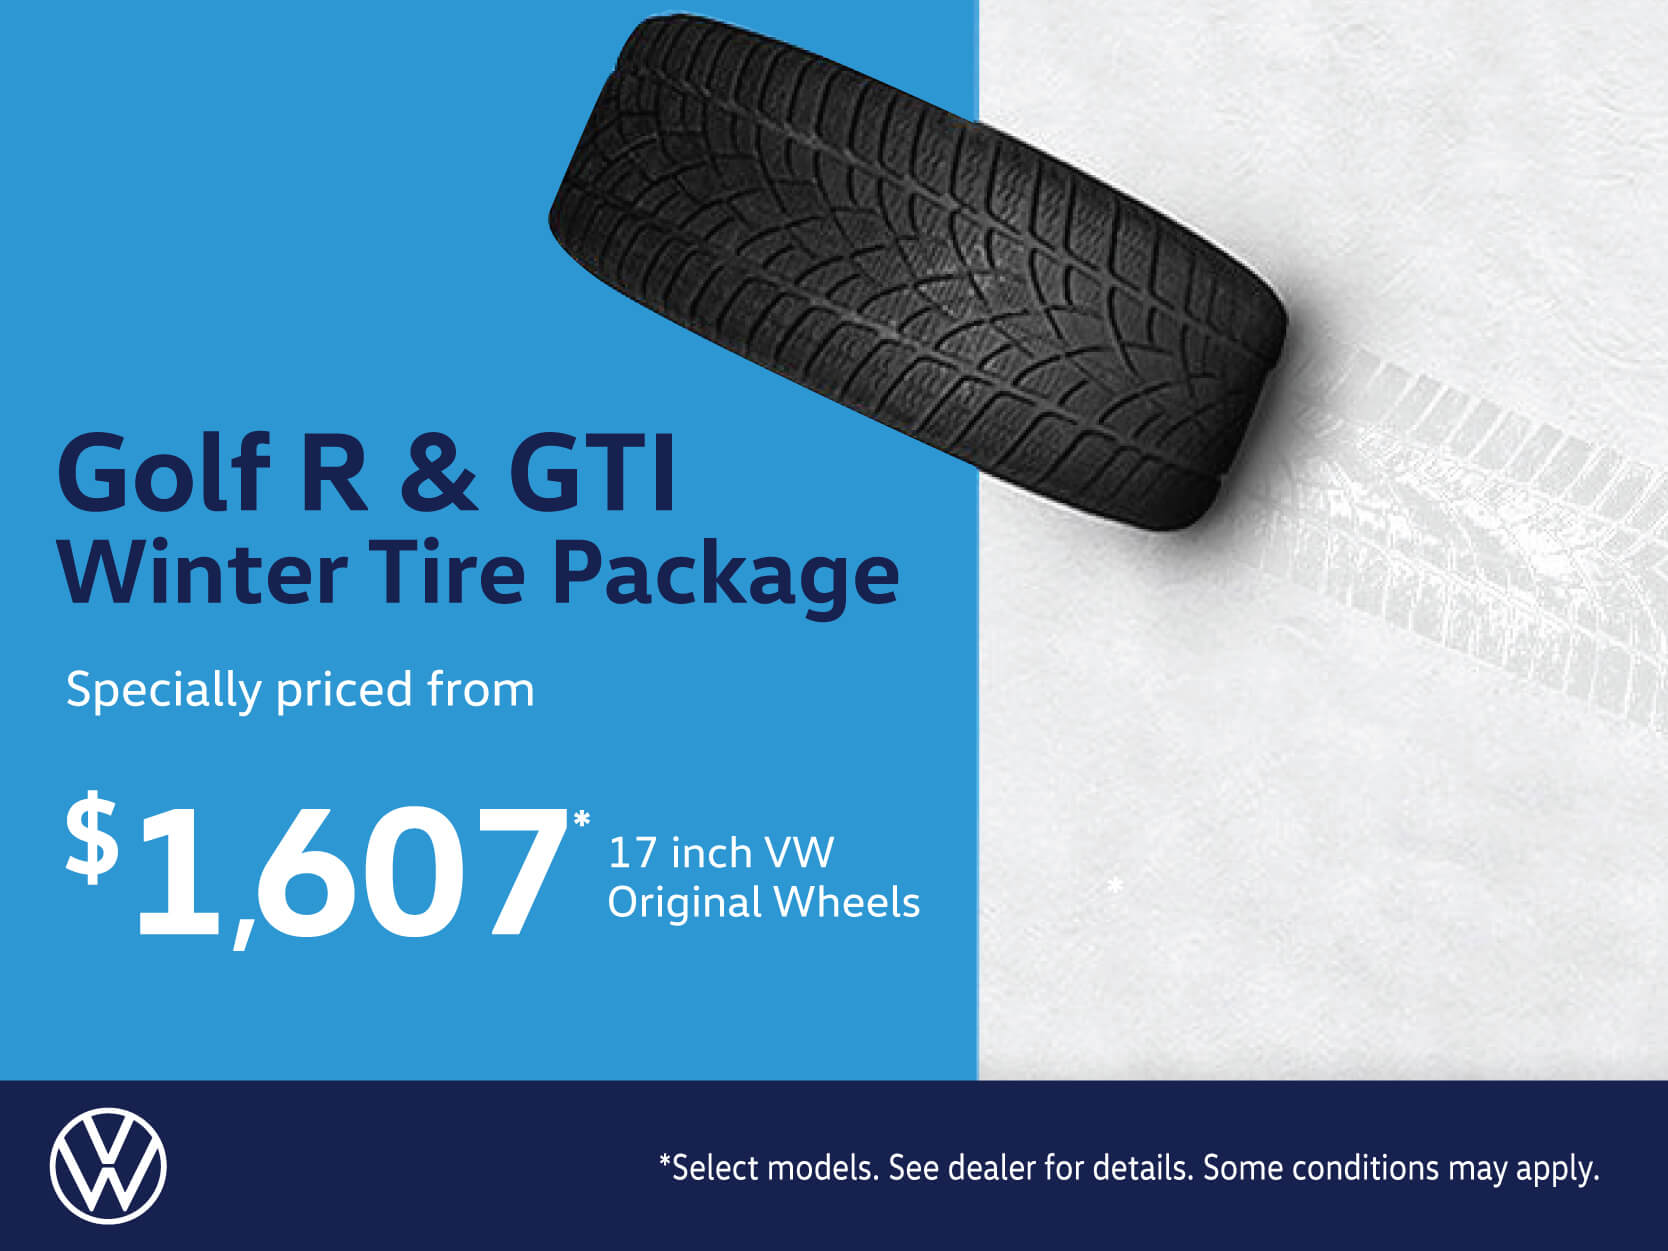 Golf R & GTI Winter Tire Package